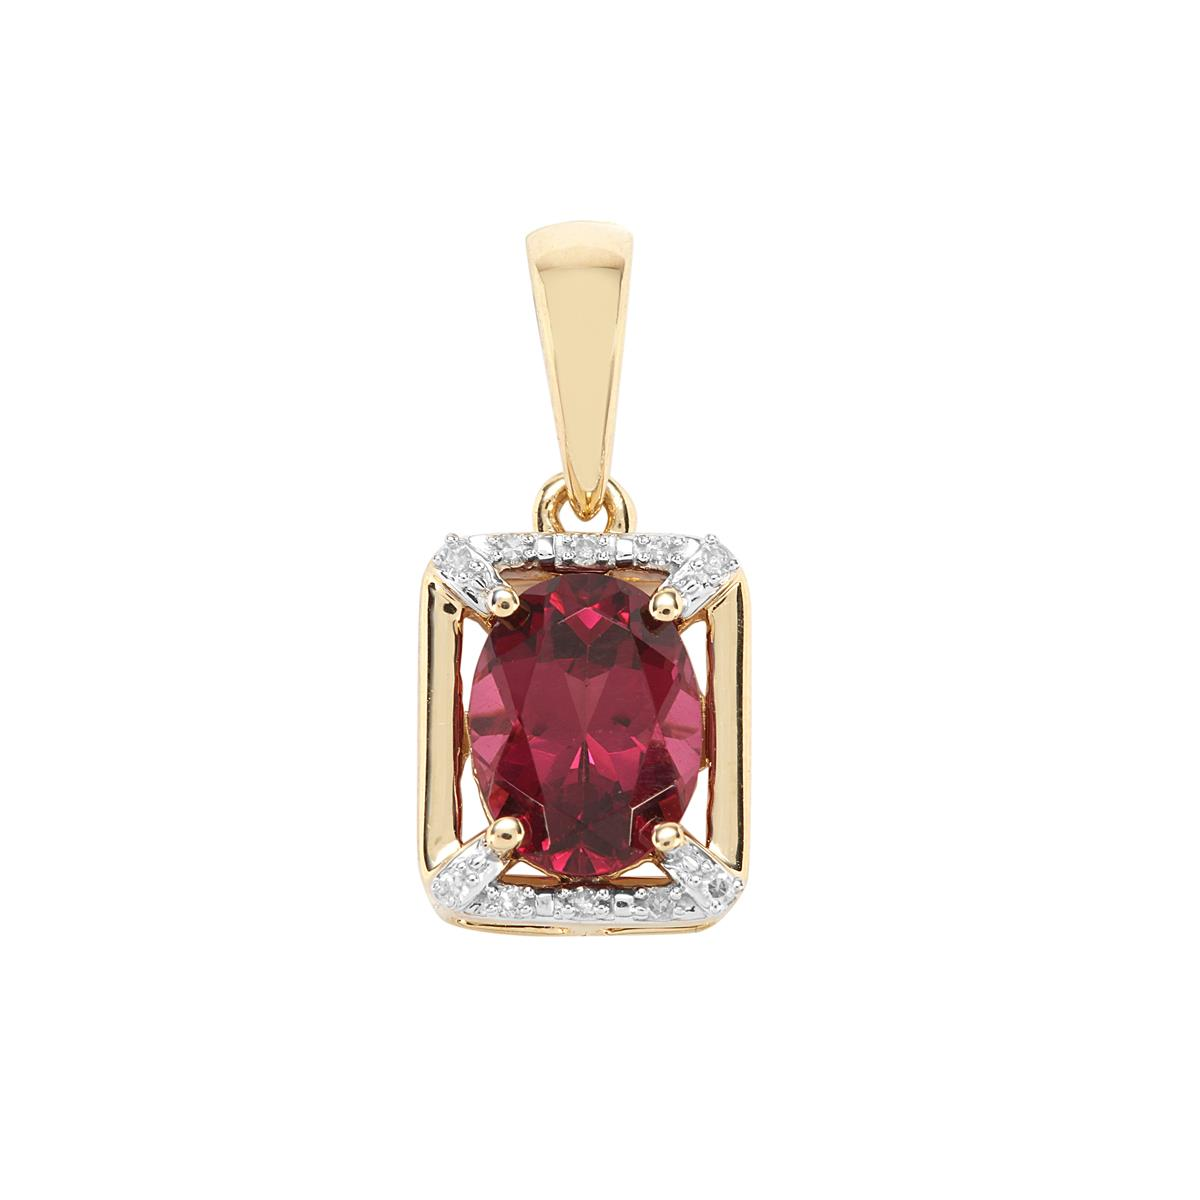 09460d77f Mahenge Pink Garnet Pendant with Diamond in 9K Gold 1.61cts   WQTQ42 ...